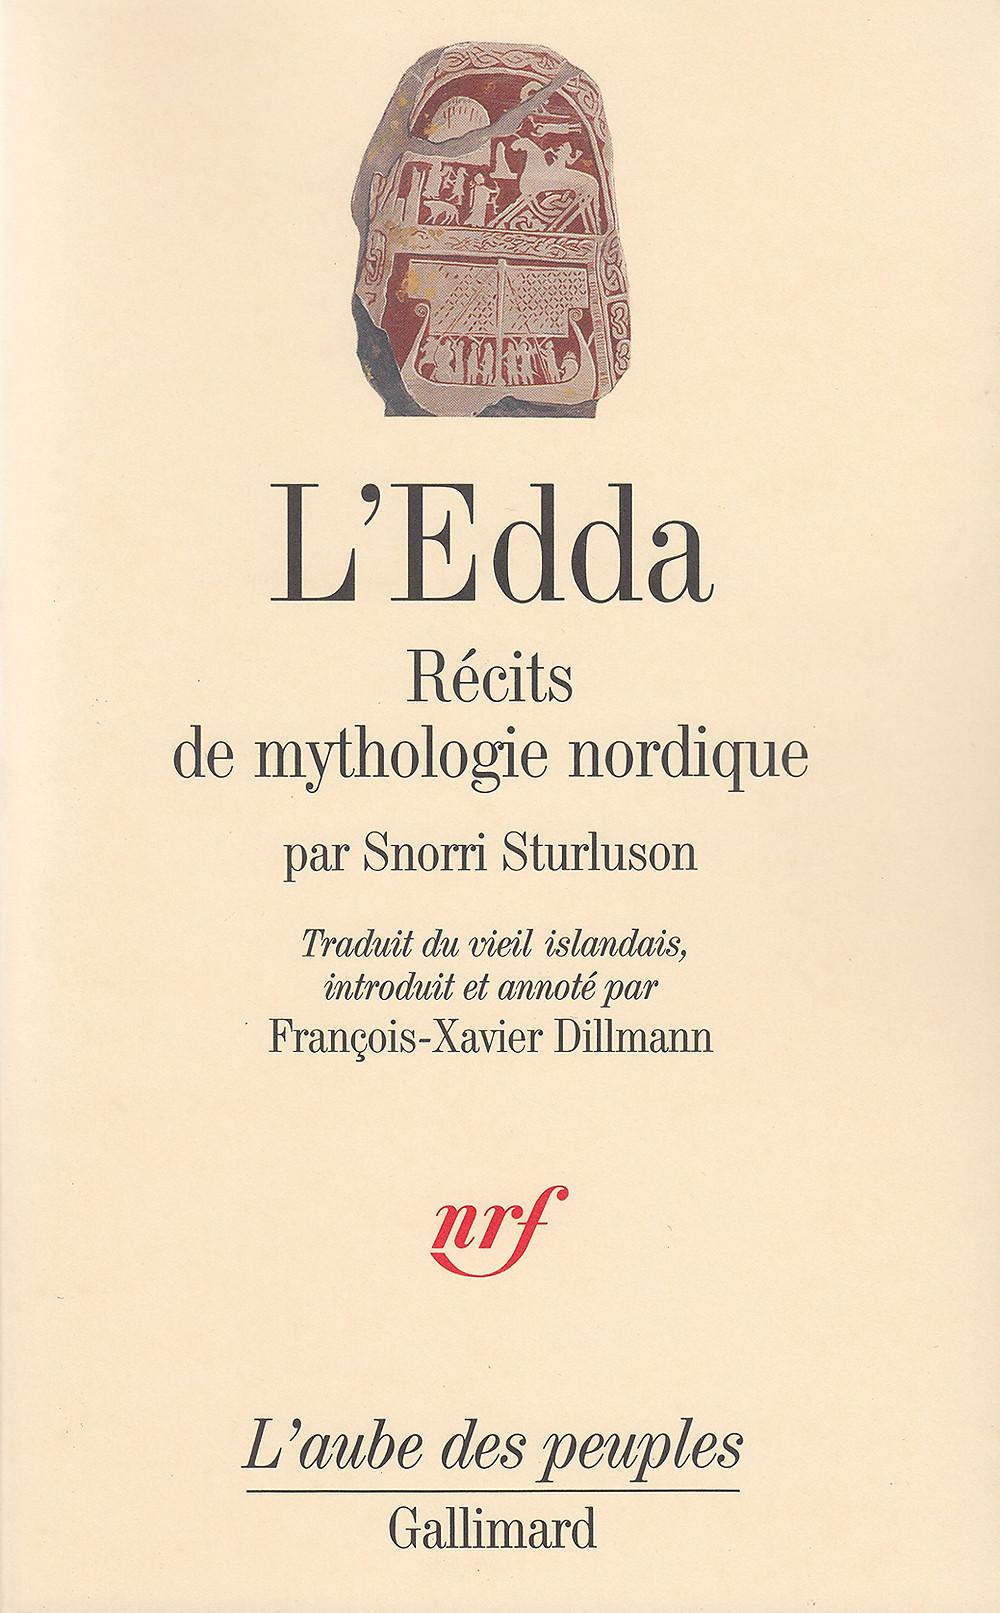 L'Edda Snorri Sturluson